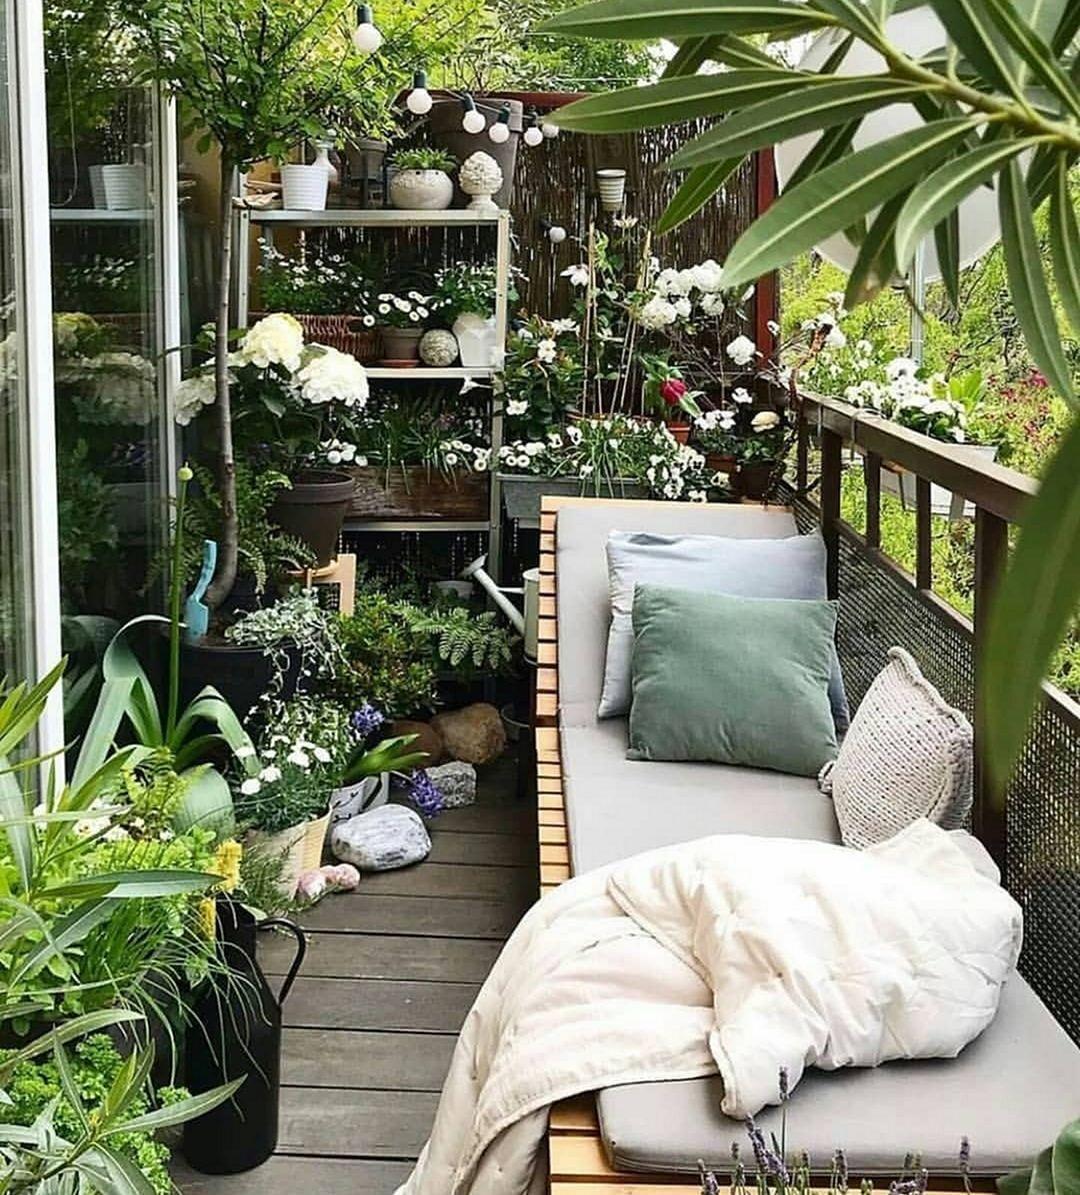 15 Fascinating Balcony Garden Design Ideas To Make Home More Fresh In 2020 Apartment Patio Outdoor Patio Space Patio Spaces